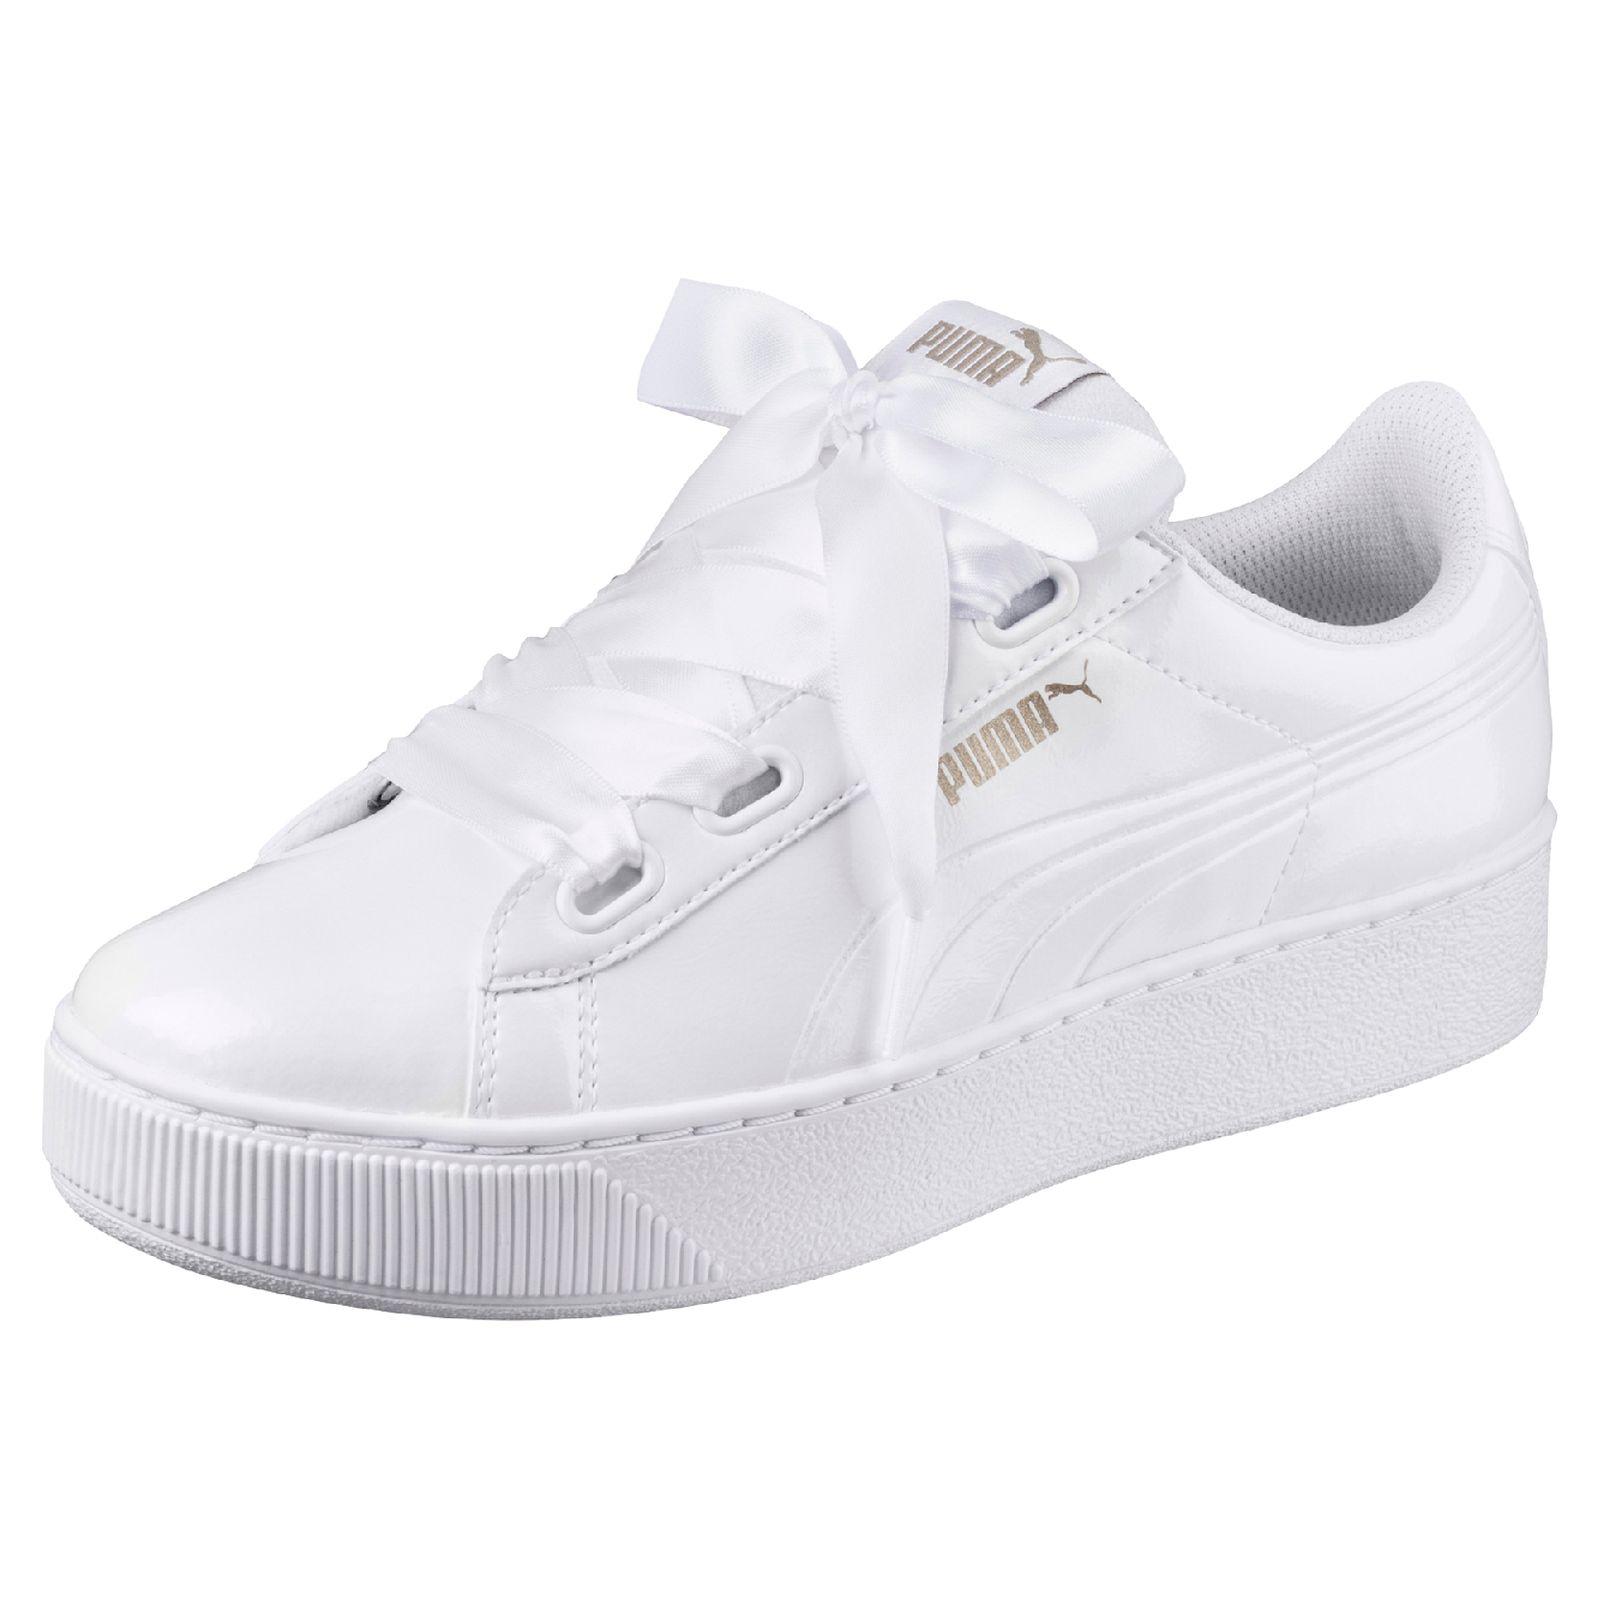 Rieker Tennis Shoes